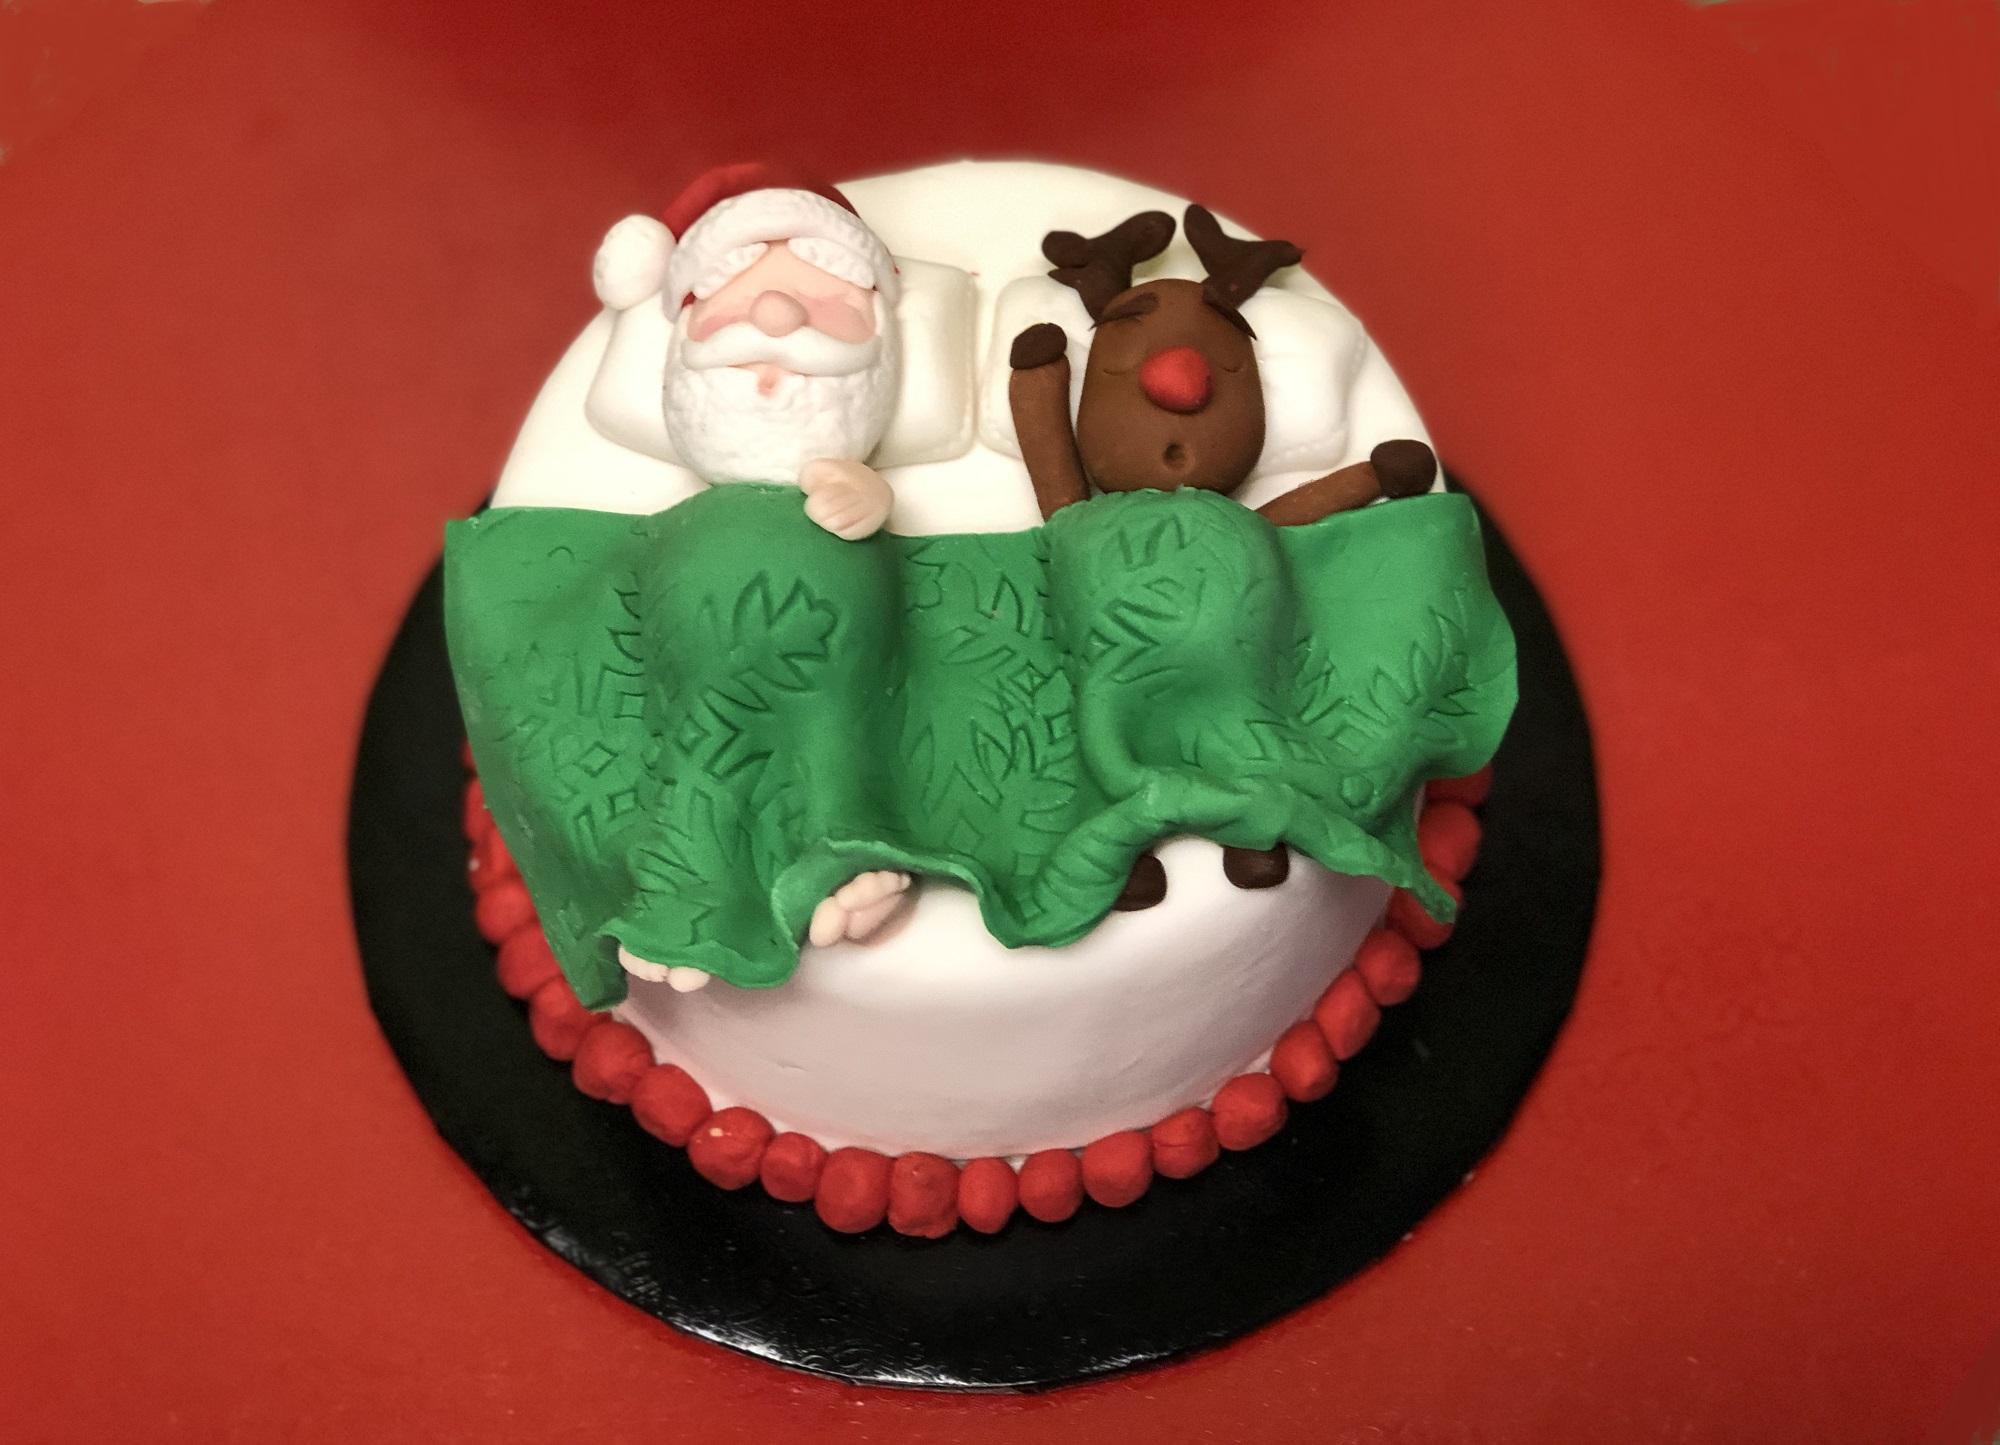 Enjoyable Resting Santa Cake Over The Top Cake Supplies San Antonio Central Birthday Cards Printable Trancafe Filternl